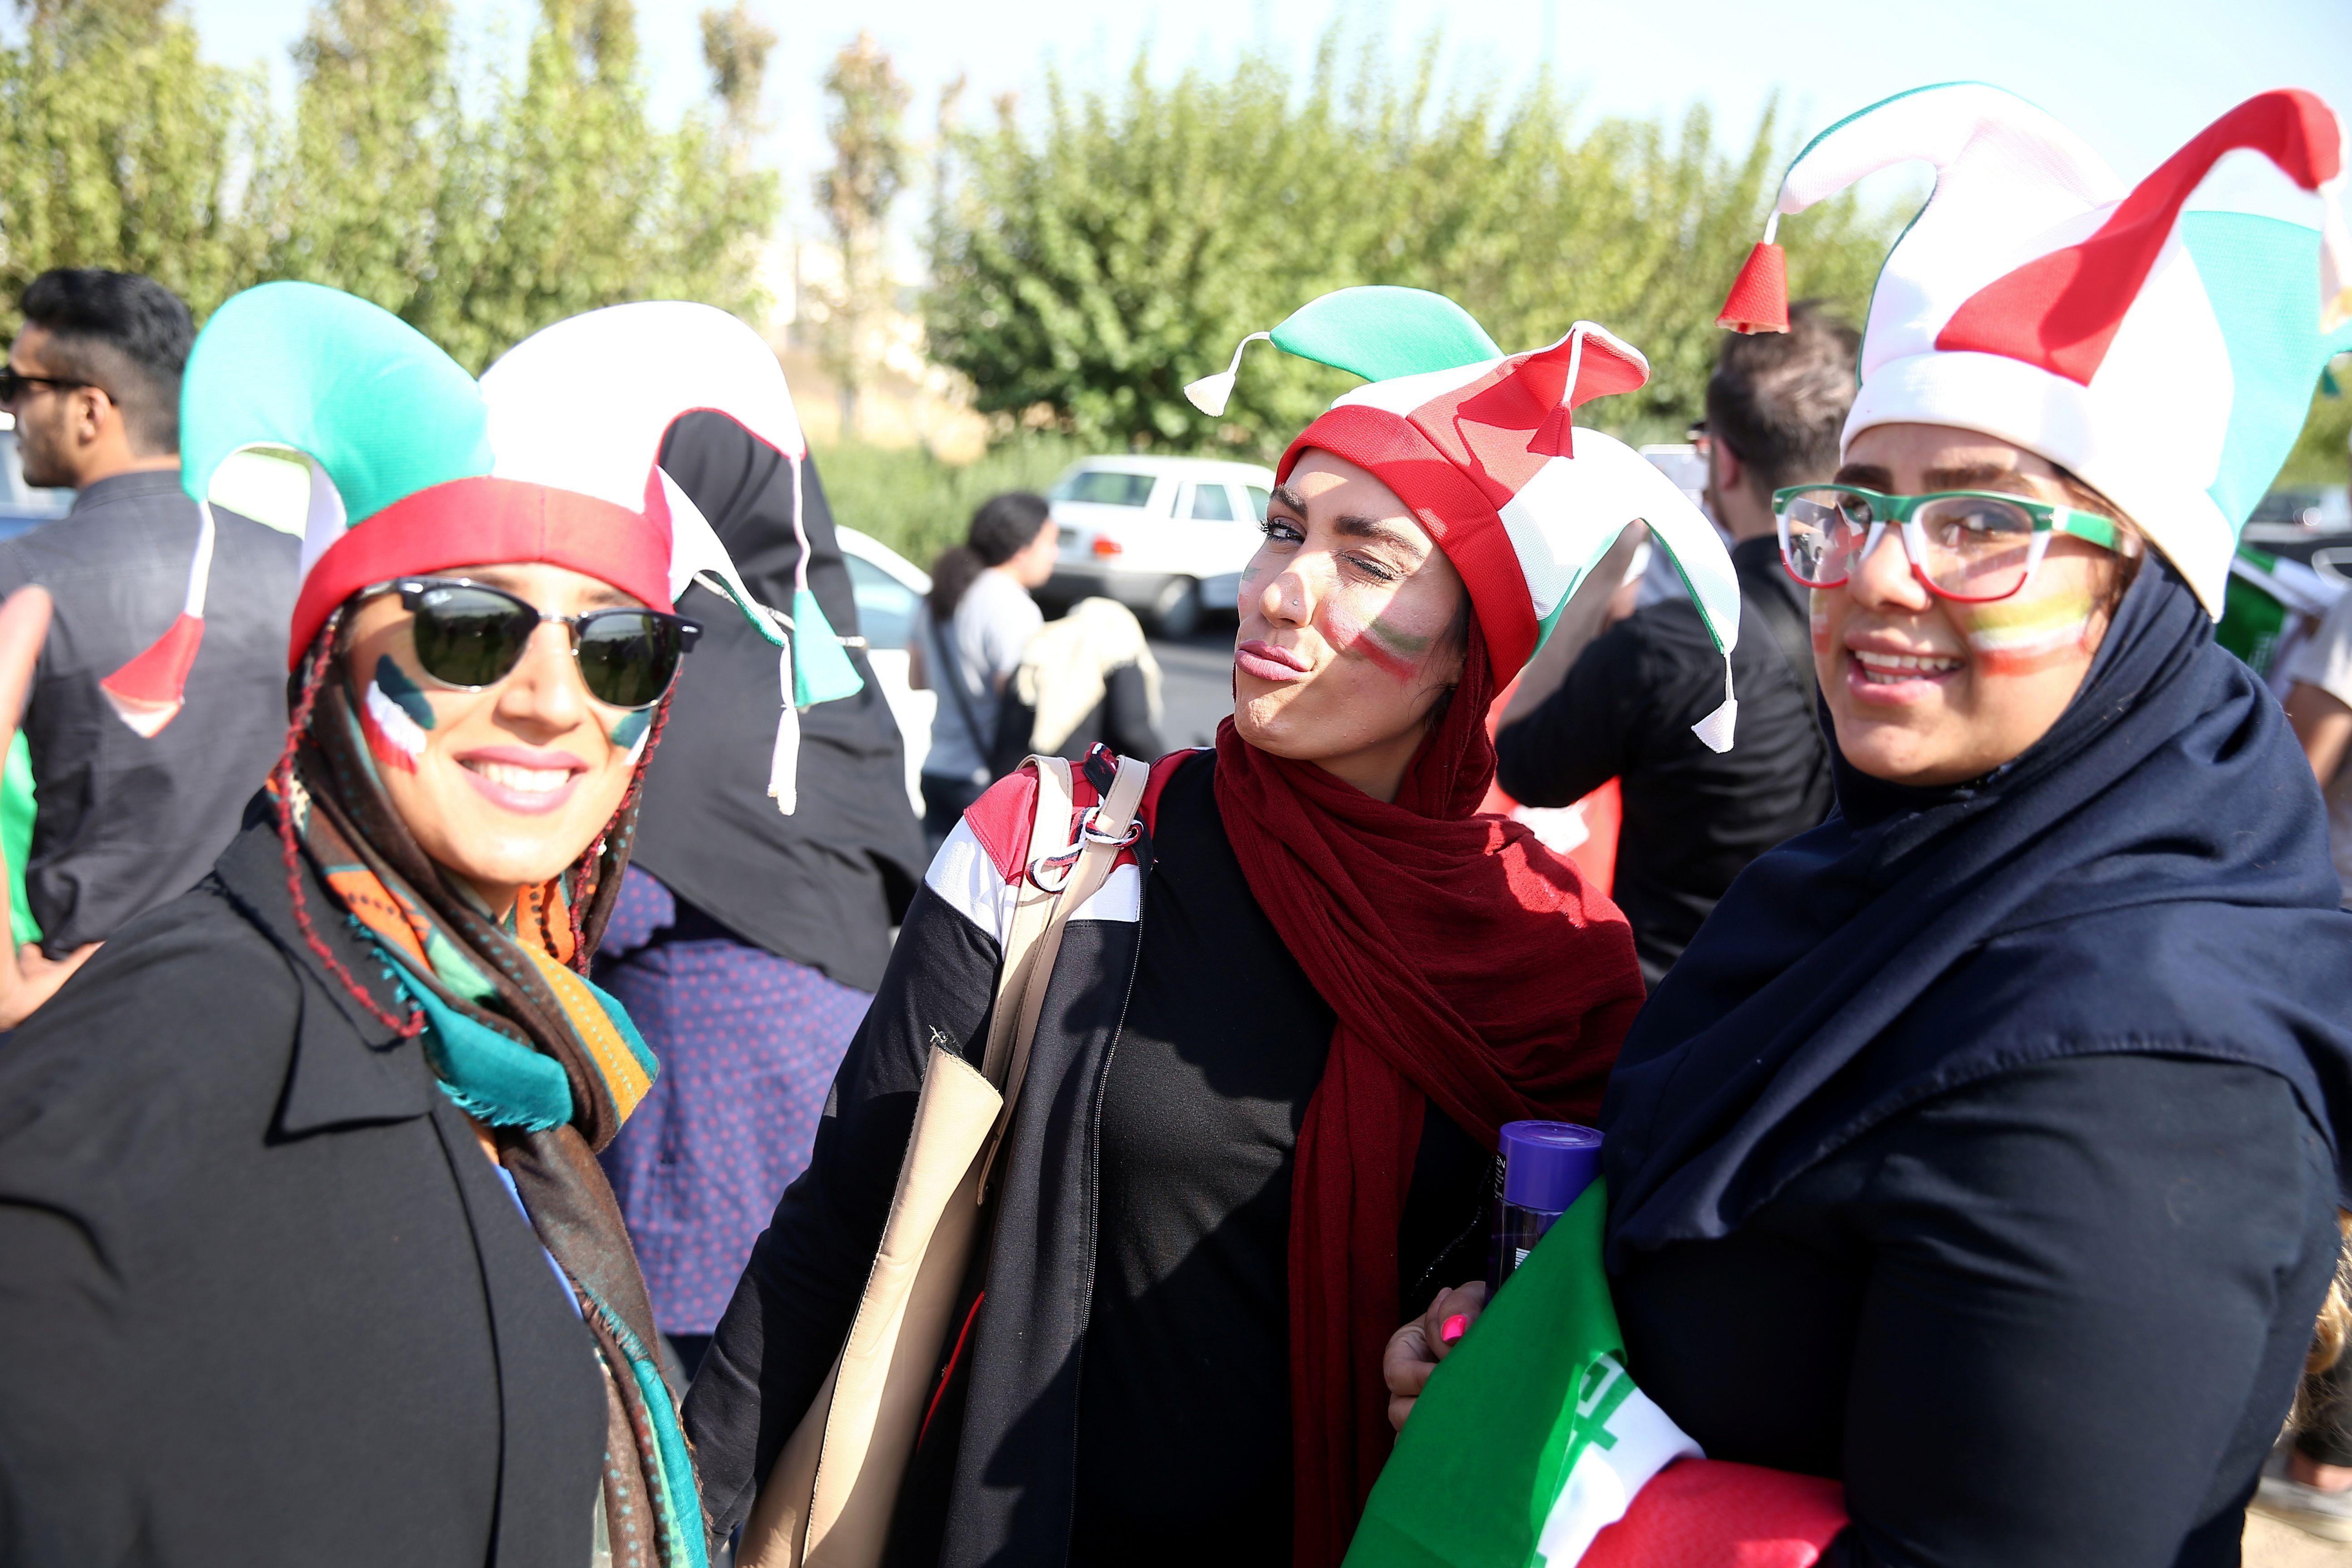 2019-10-10T141933Z_597092567_RC186EB6FA30_RTRMADP_3_IRAN-SOCCER-WOMEN-1